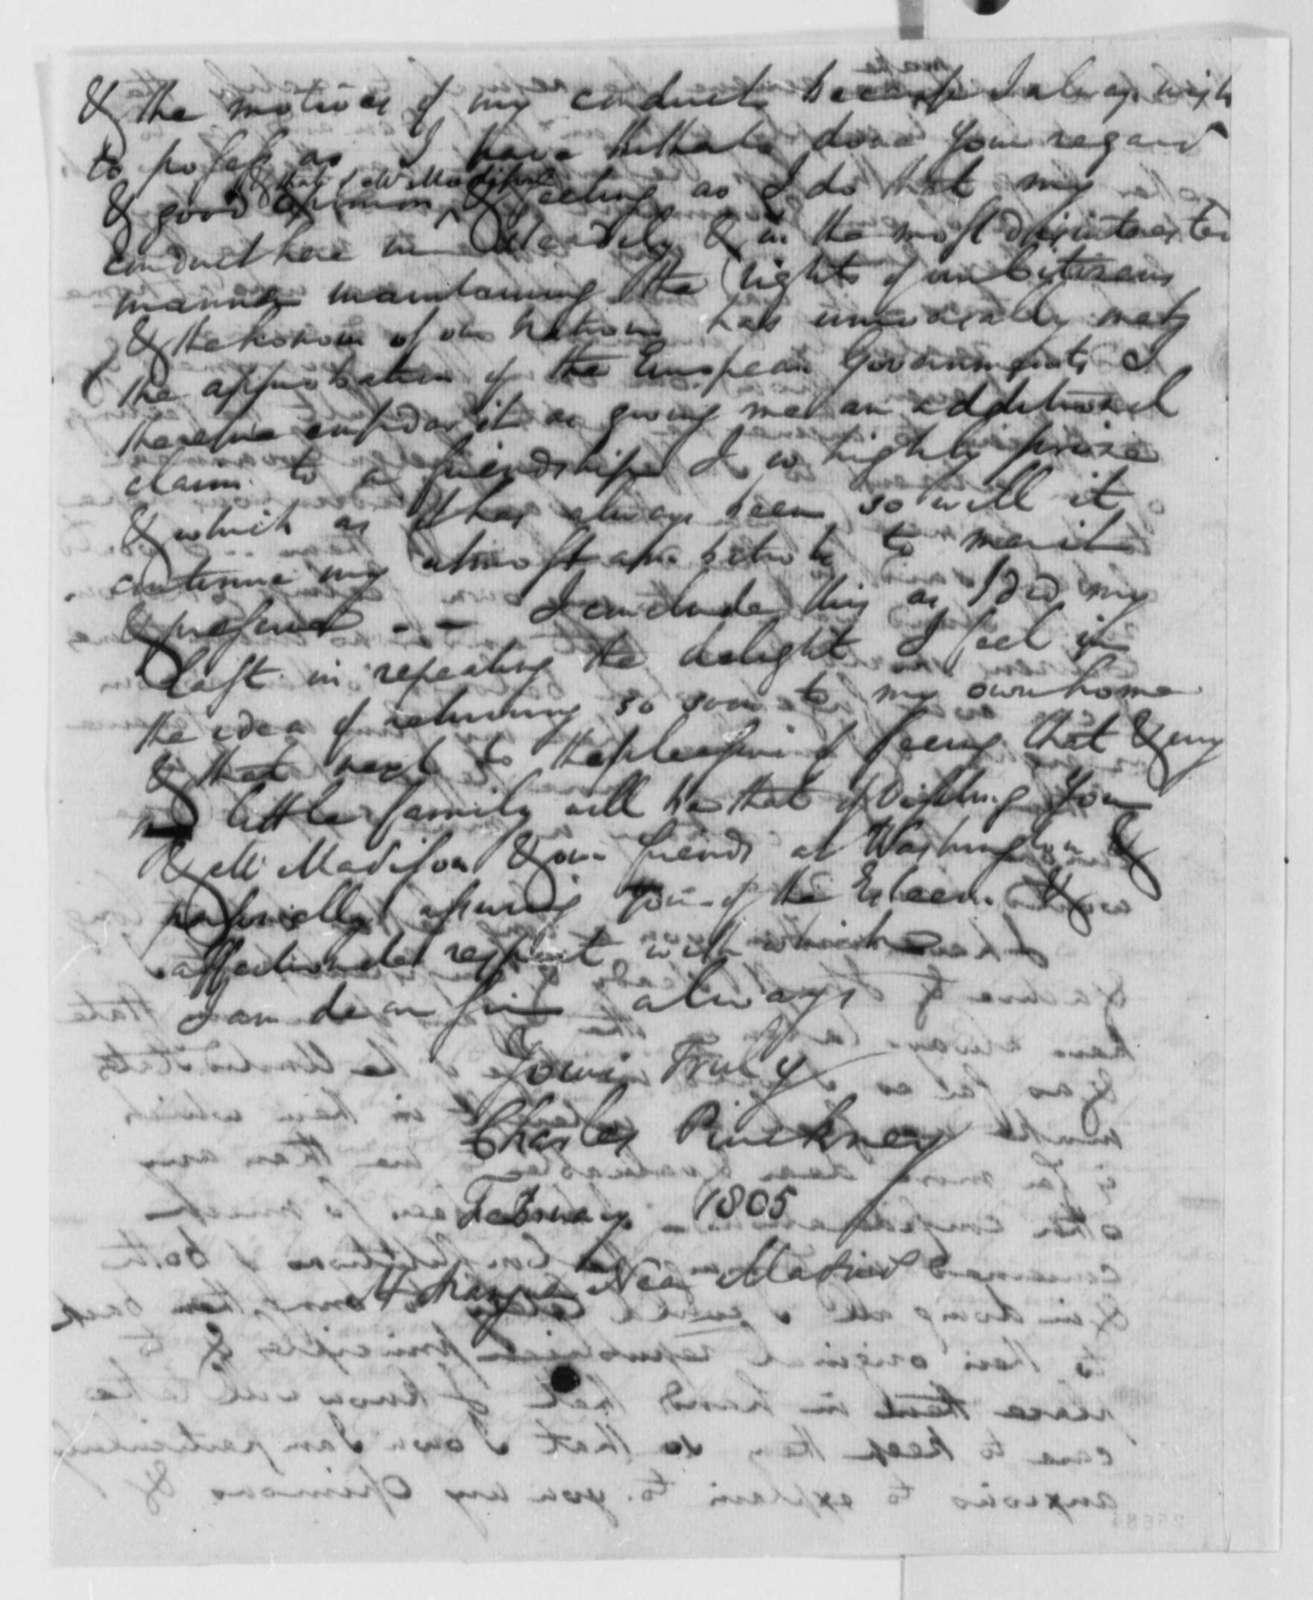 Charles Pinckney to Thomas Jefferson, February 1805